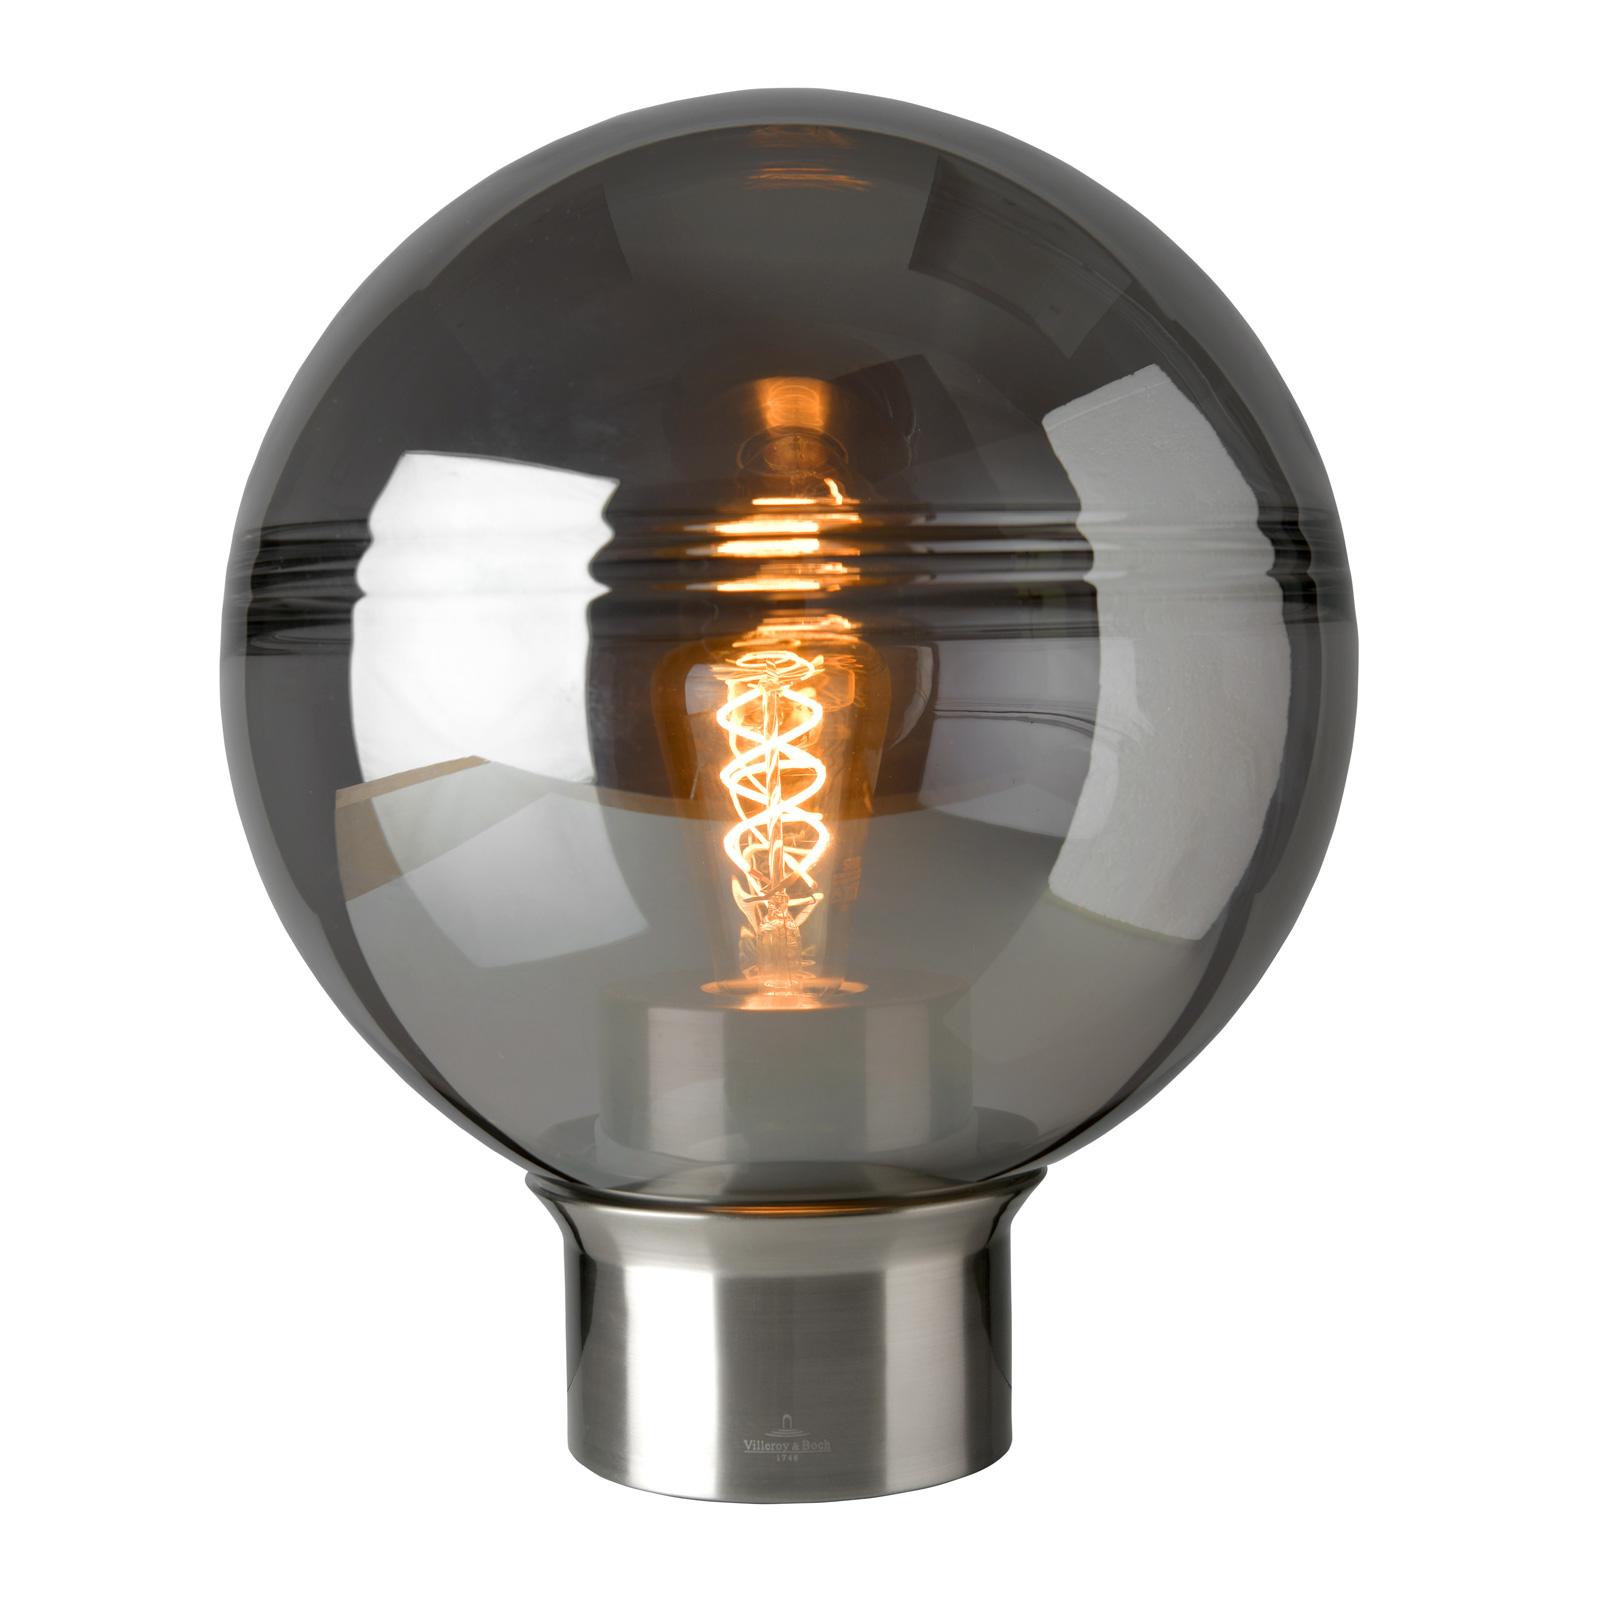 Villeroy & Boch Tokyo lampe à poser satinée Ø 30cm